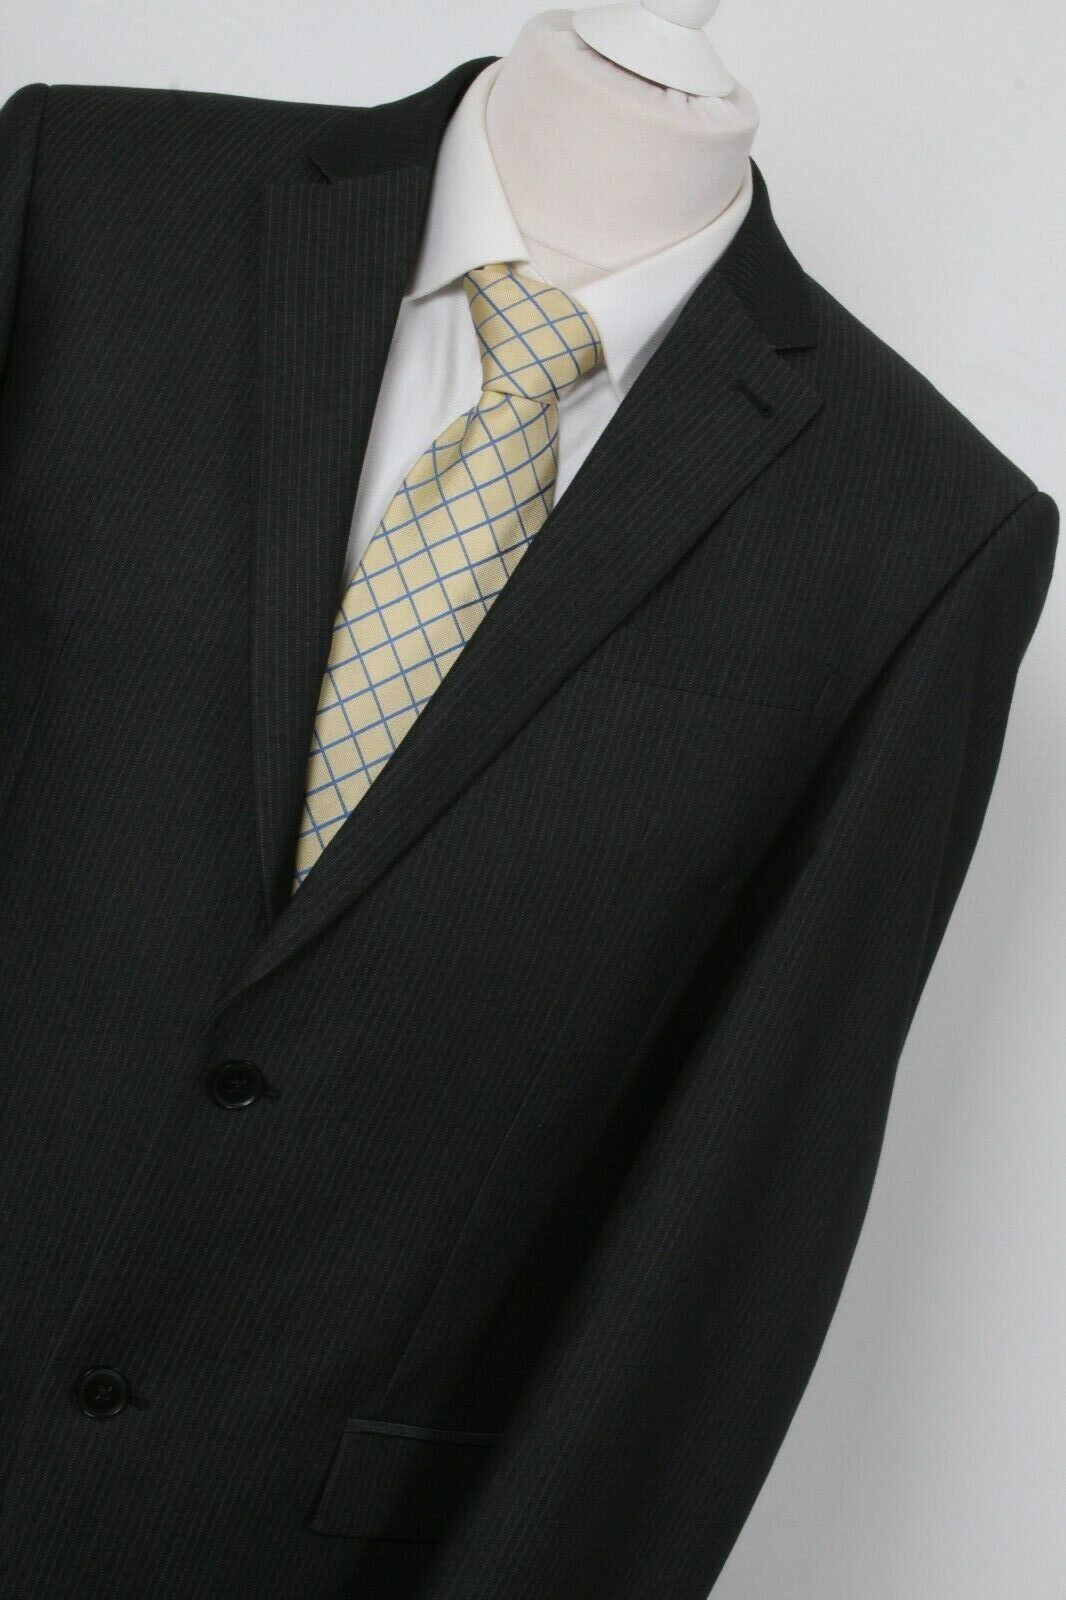 NEXT GREY PINSTRIPE RRP  Single Breasted Suit Blazer Wool Mix 40 Long 50